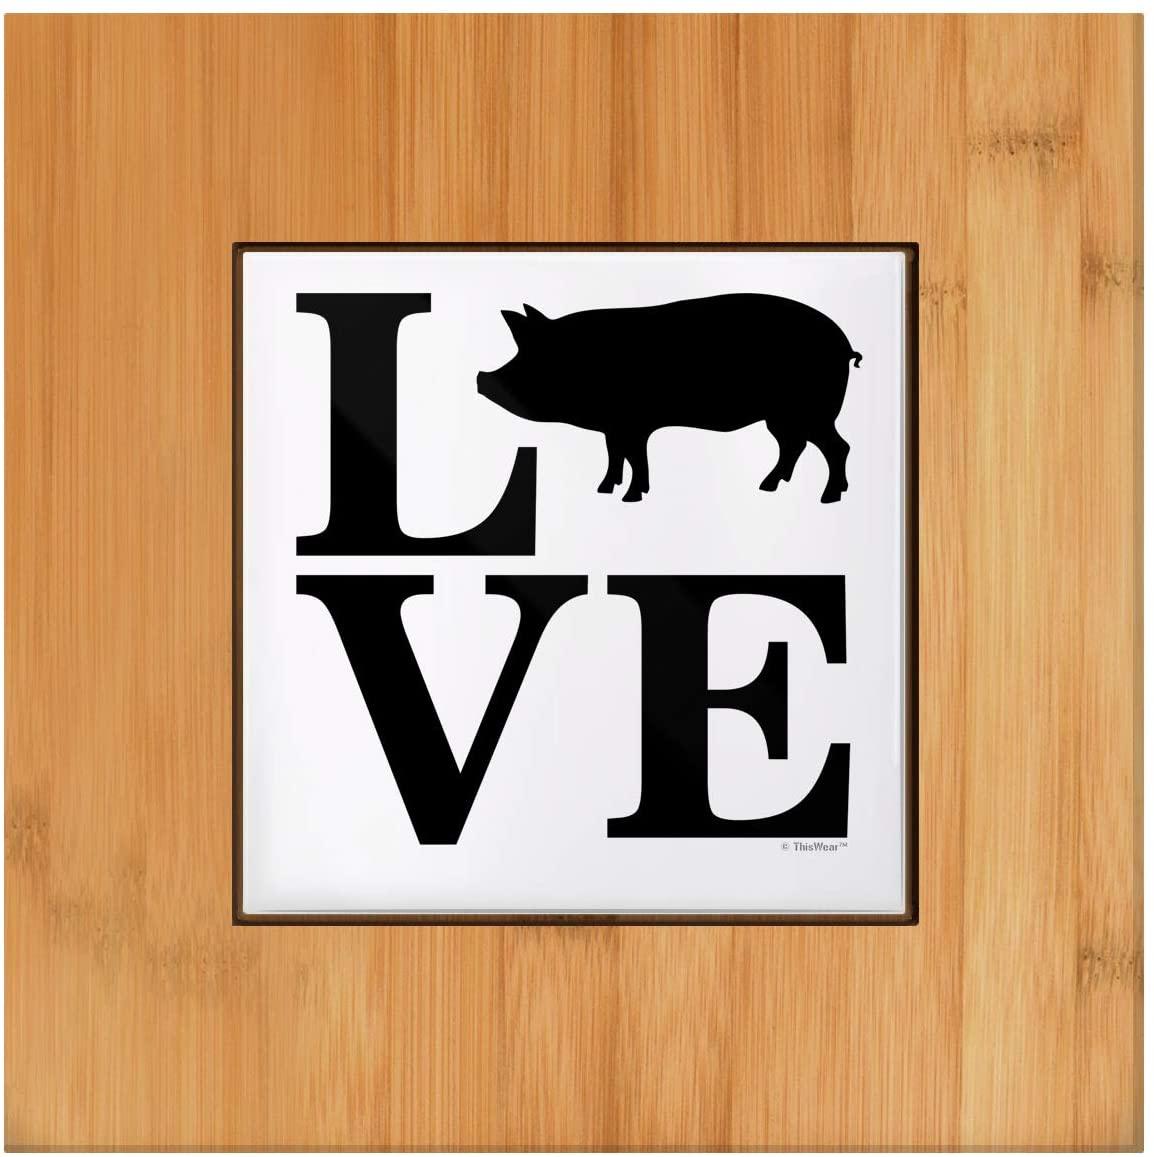 Pig Kitchen Decor LOVE Pig Farmhouse Decor Pig Themed Gifts Barnyard Animal Tile and Wood Trivet